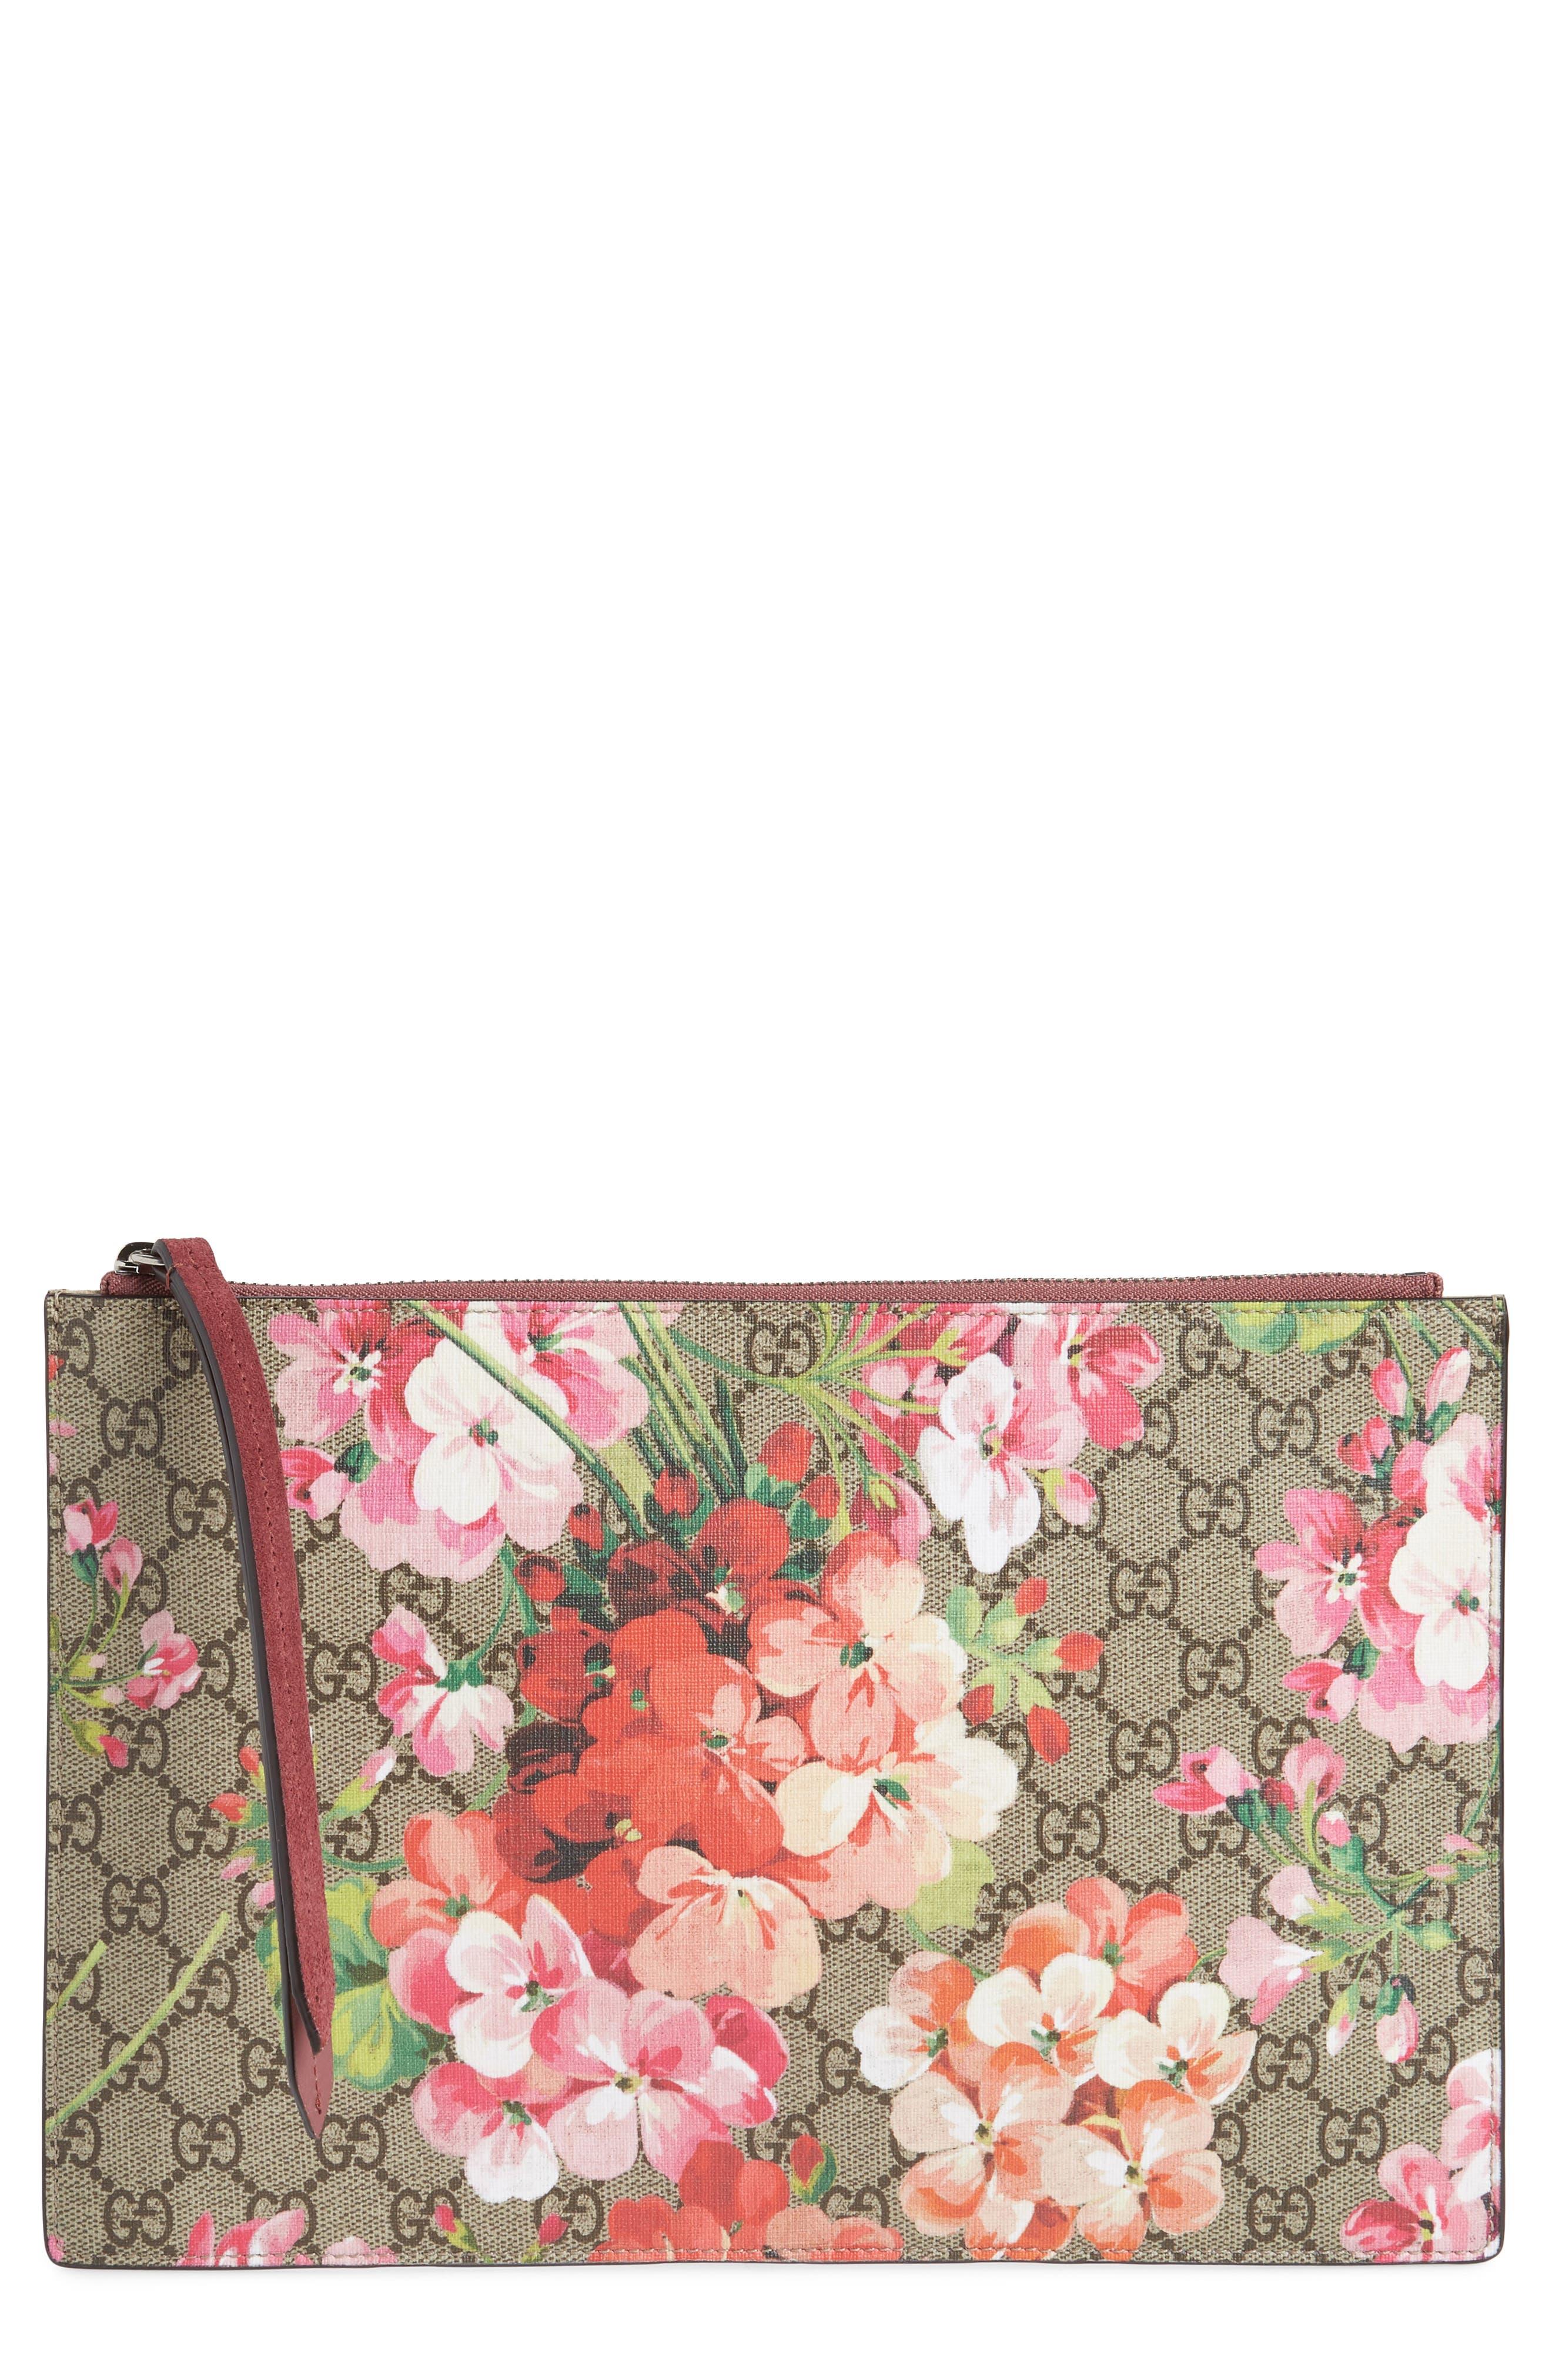 GG Blooms Large Canvas & Suede Pouch,                             Main thumbnail 1, color,                             250